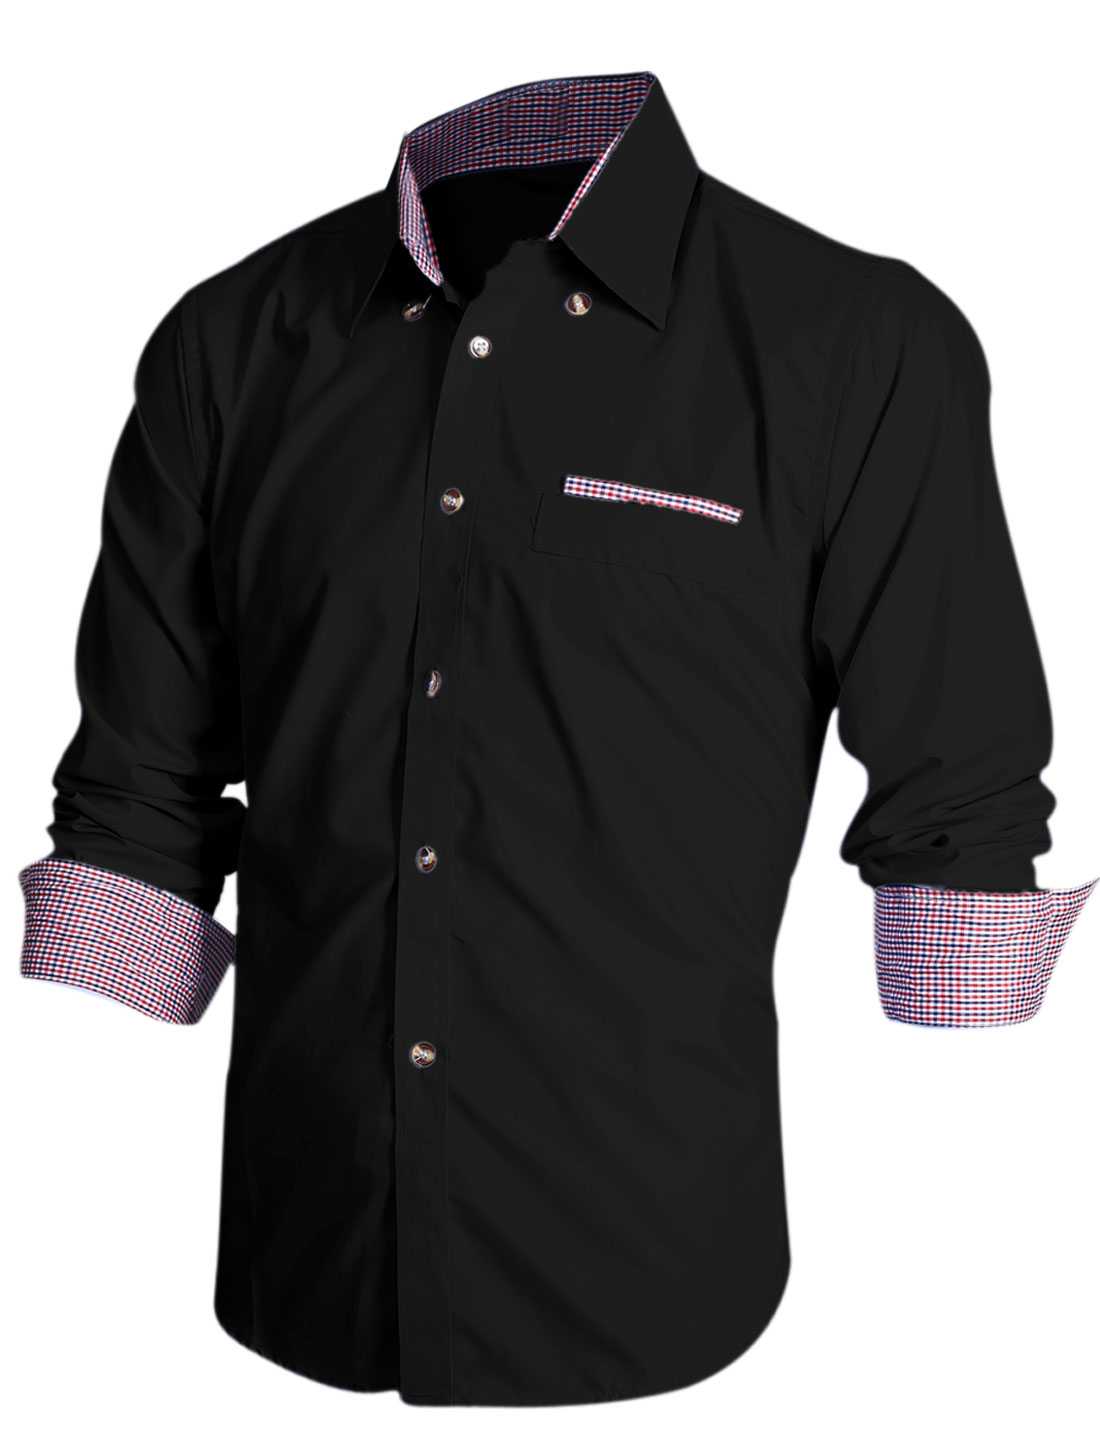 Men Point Collar Single Breasted Mock Pocket Design Casual Shirt Black M